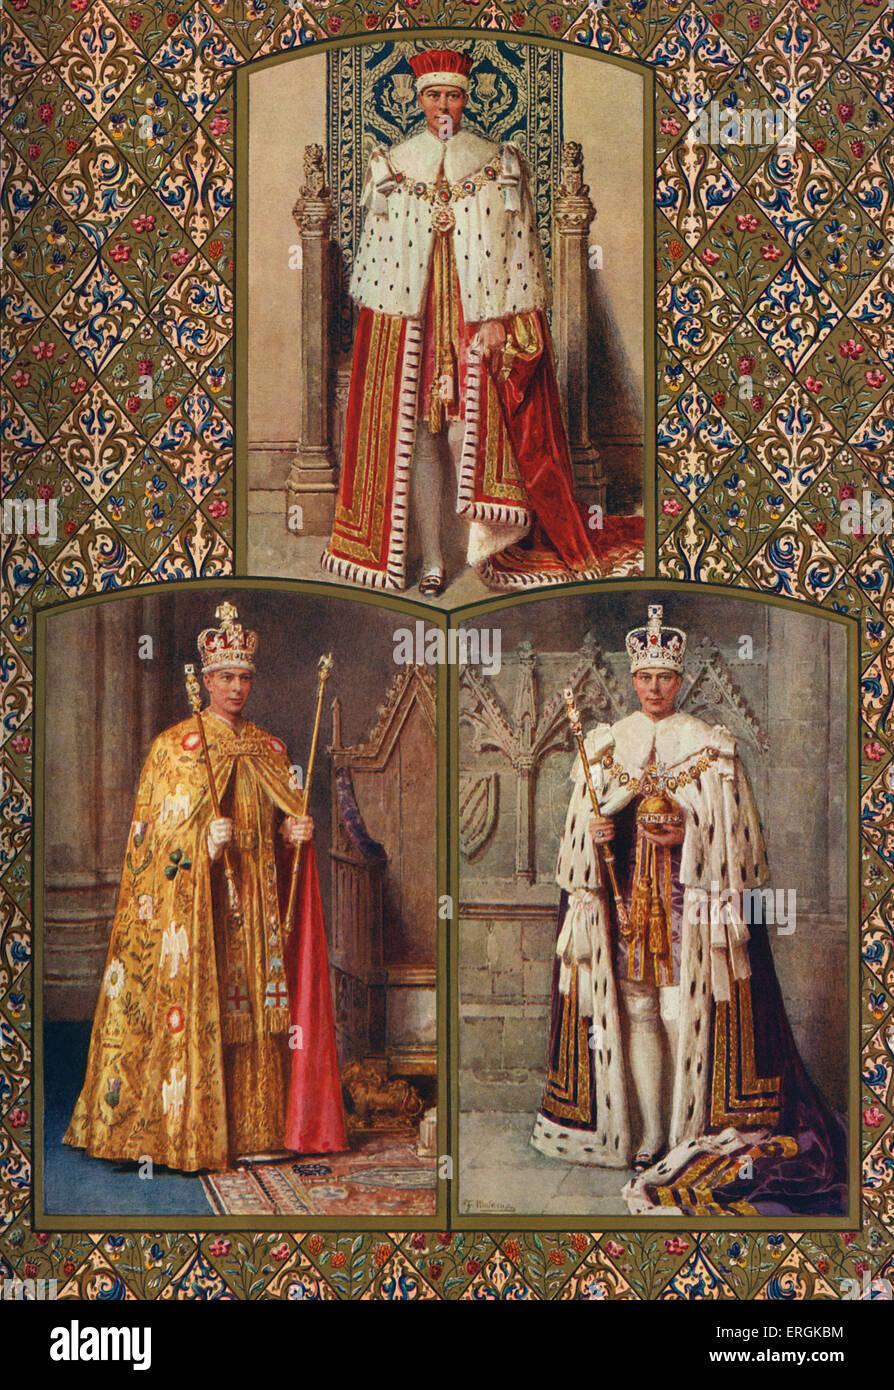 le couronnement du roi le couronnement du roi les robes robe pourpre d 39 tat le manteau. Black Bedroom Furniture Sets. Home Design Ideas